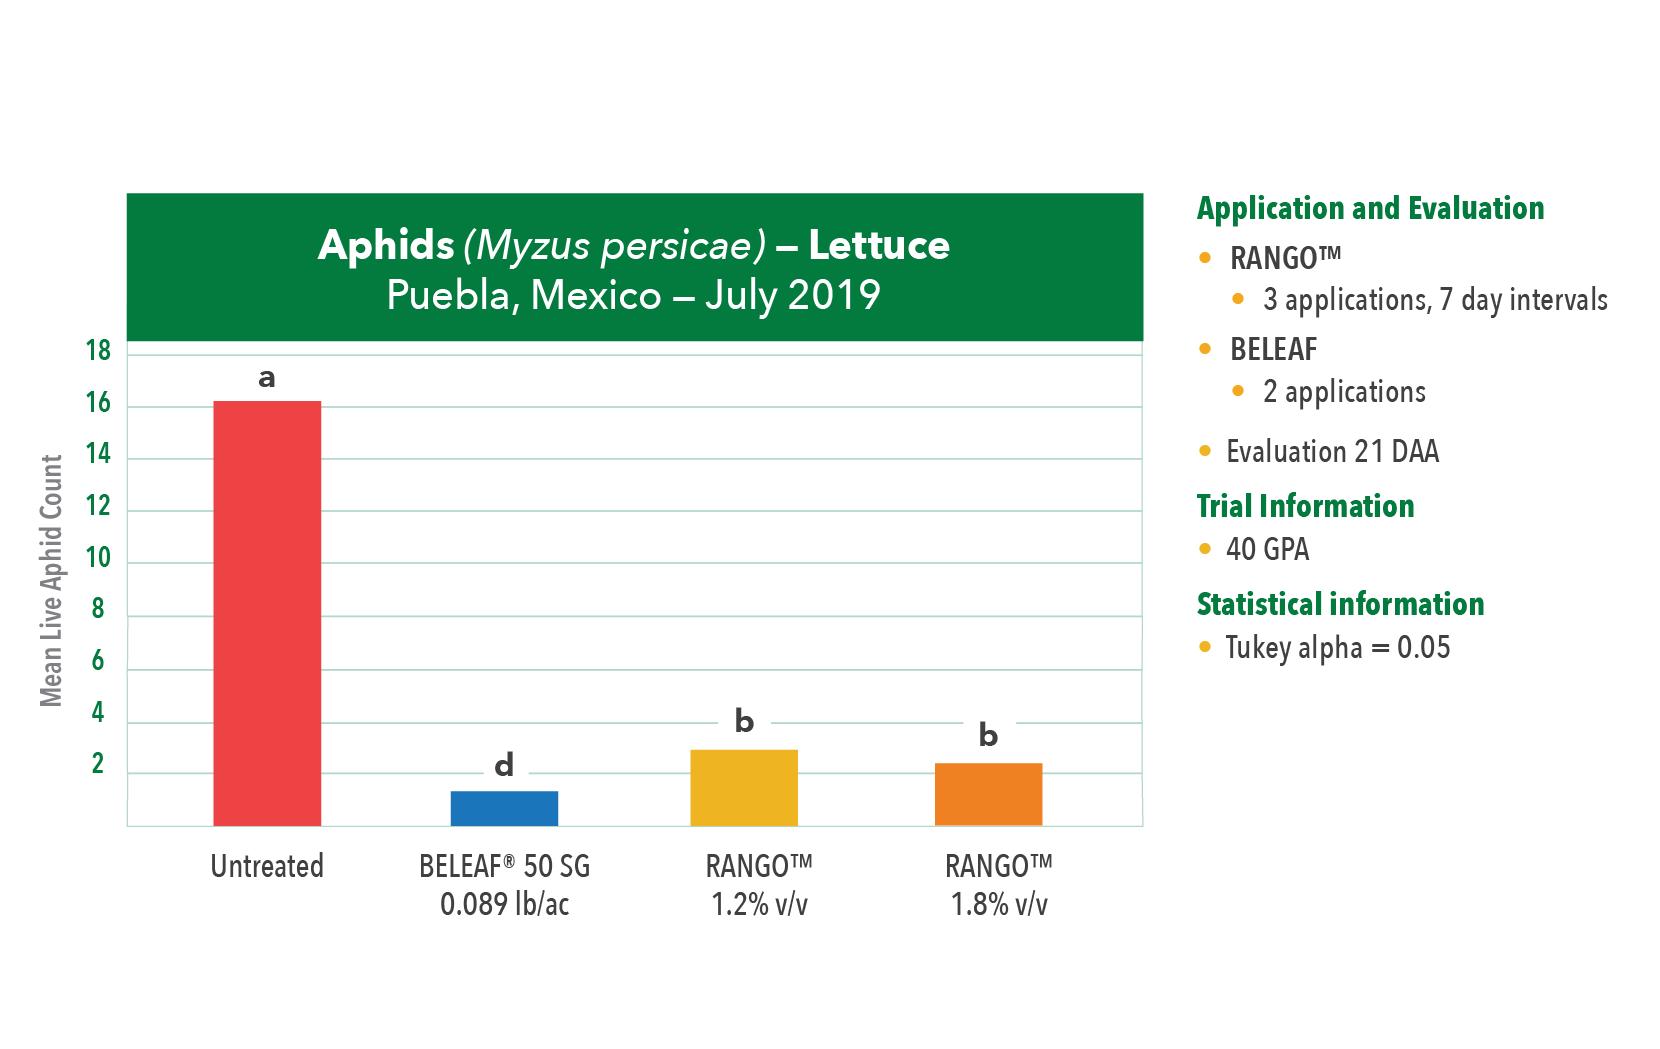 Terramera-RANGO-Lettuce-Chart-01-Aphids02 (Myzus persicae) — Lettuce